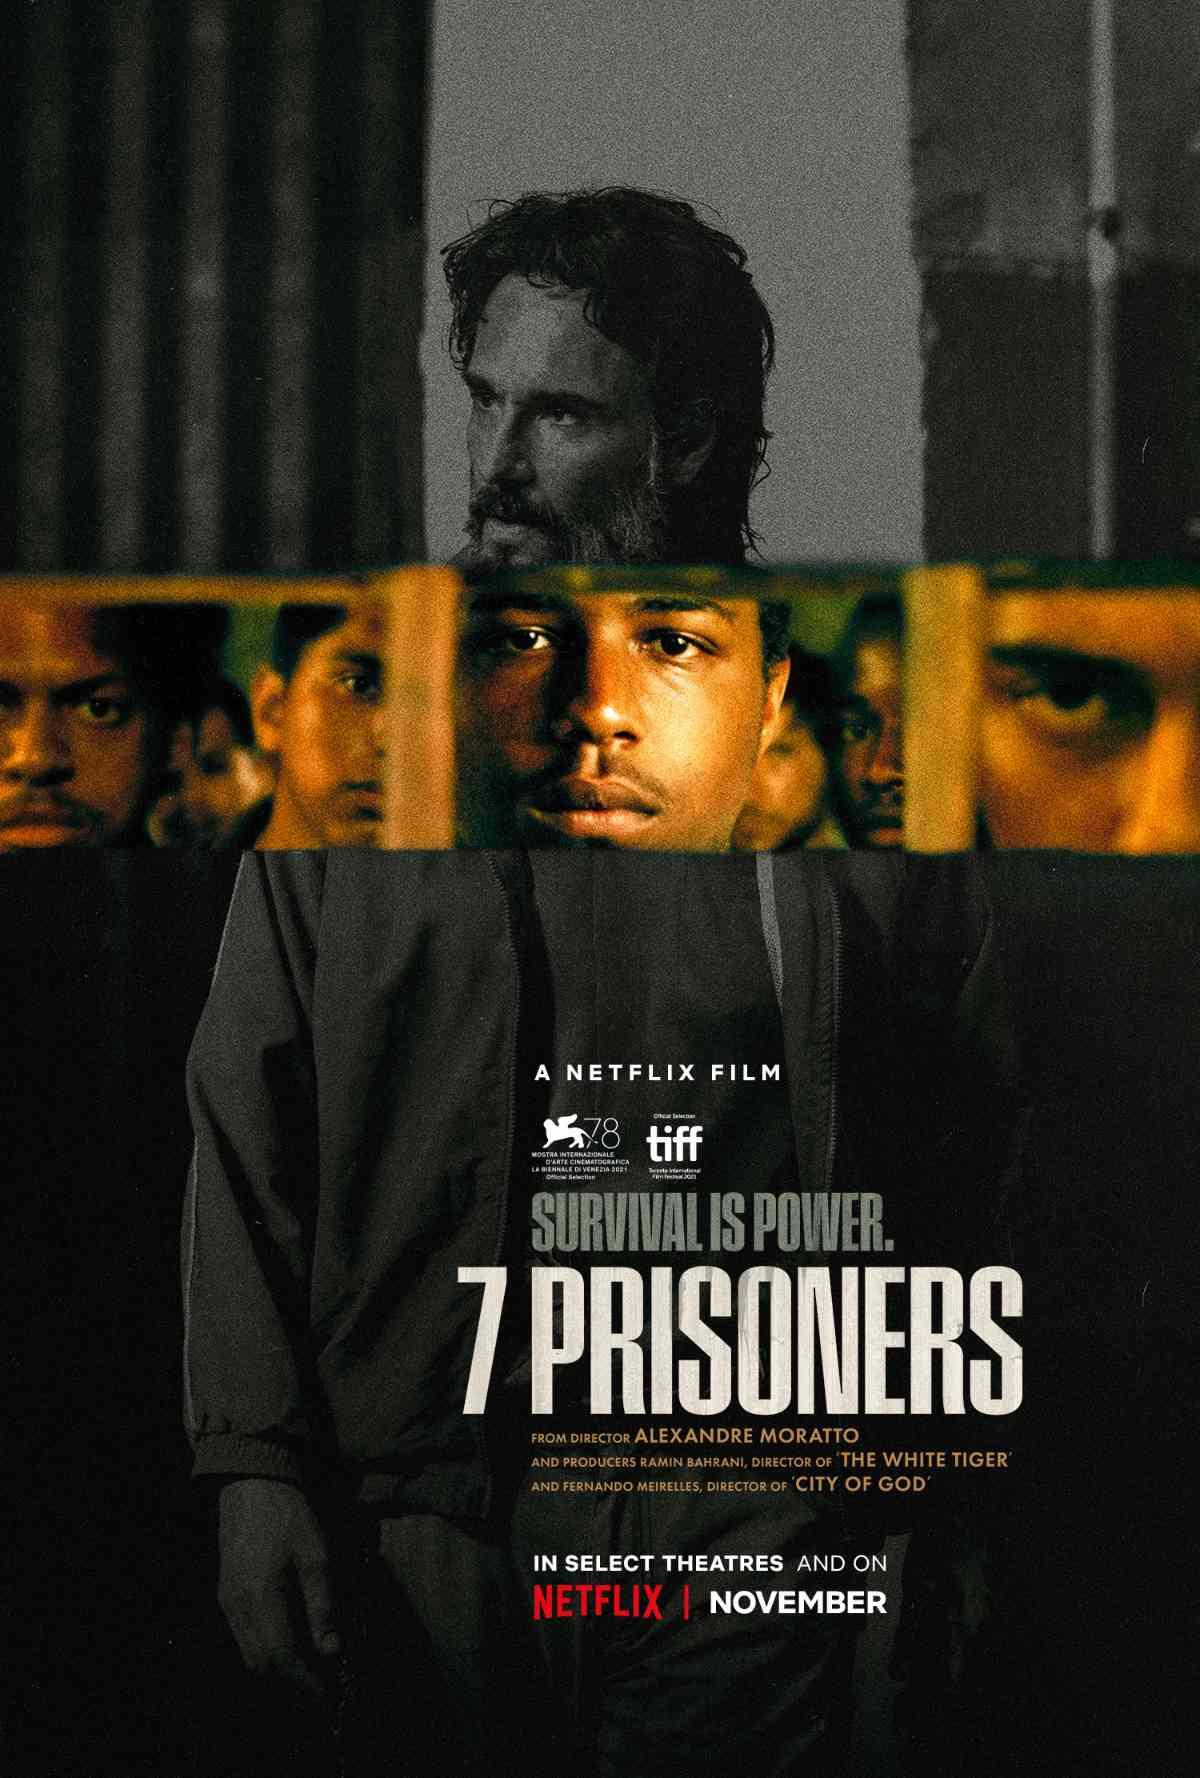 7 Prisoners